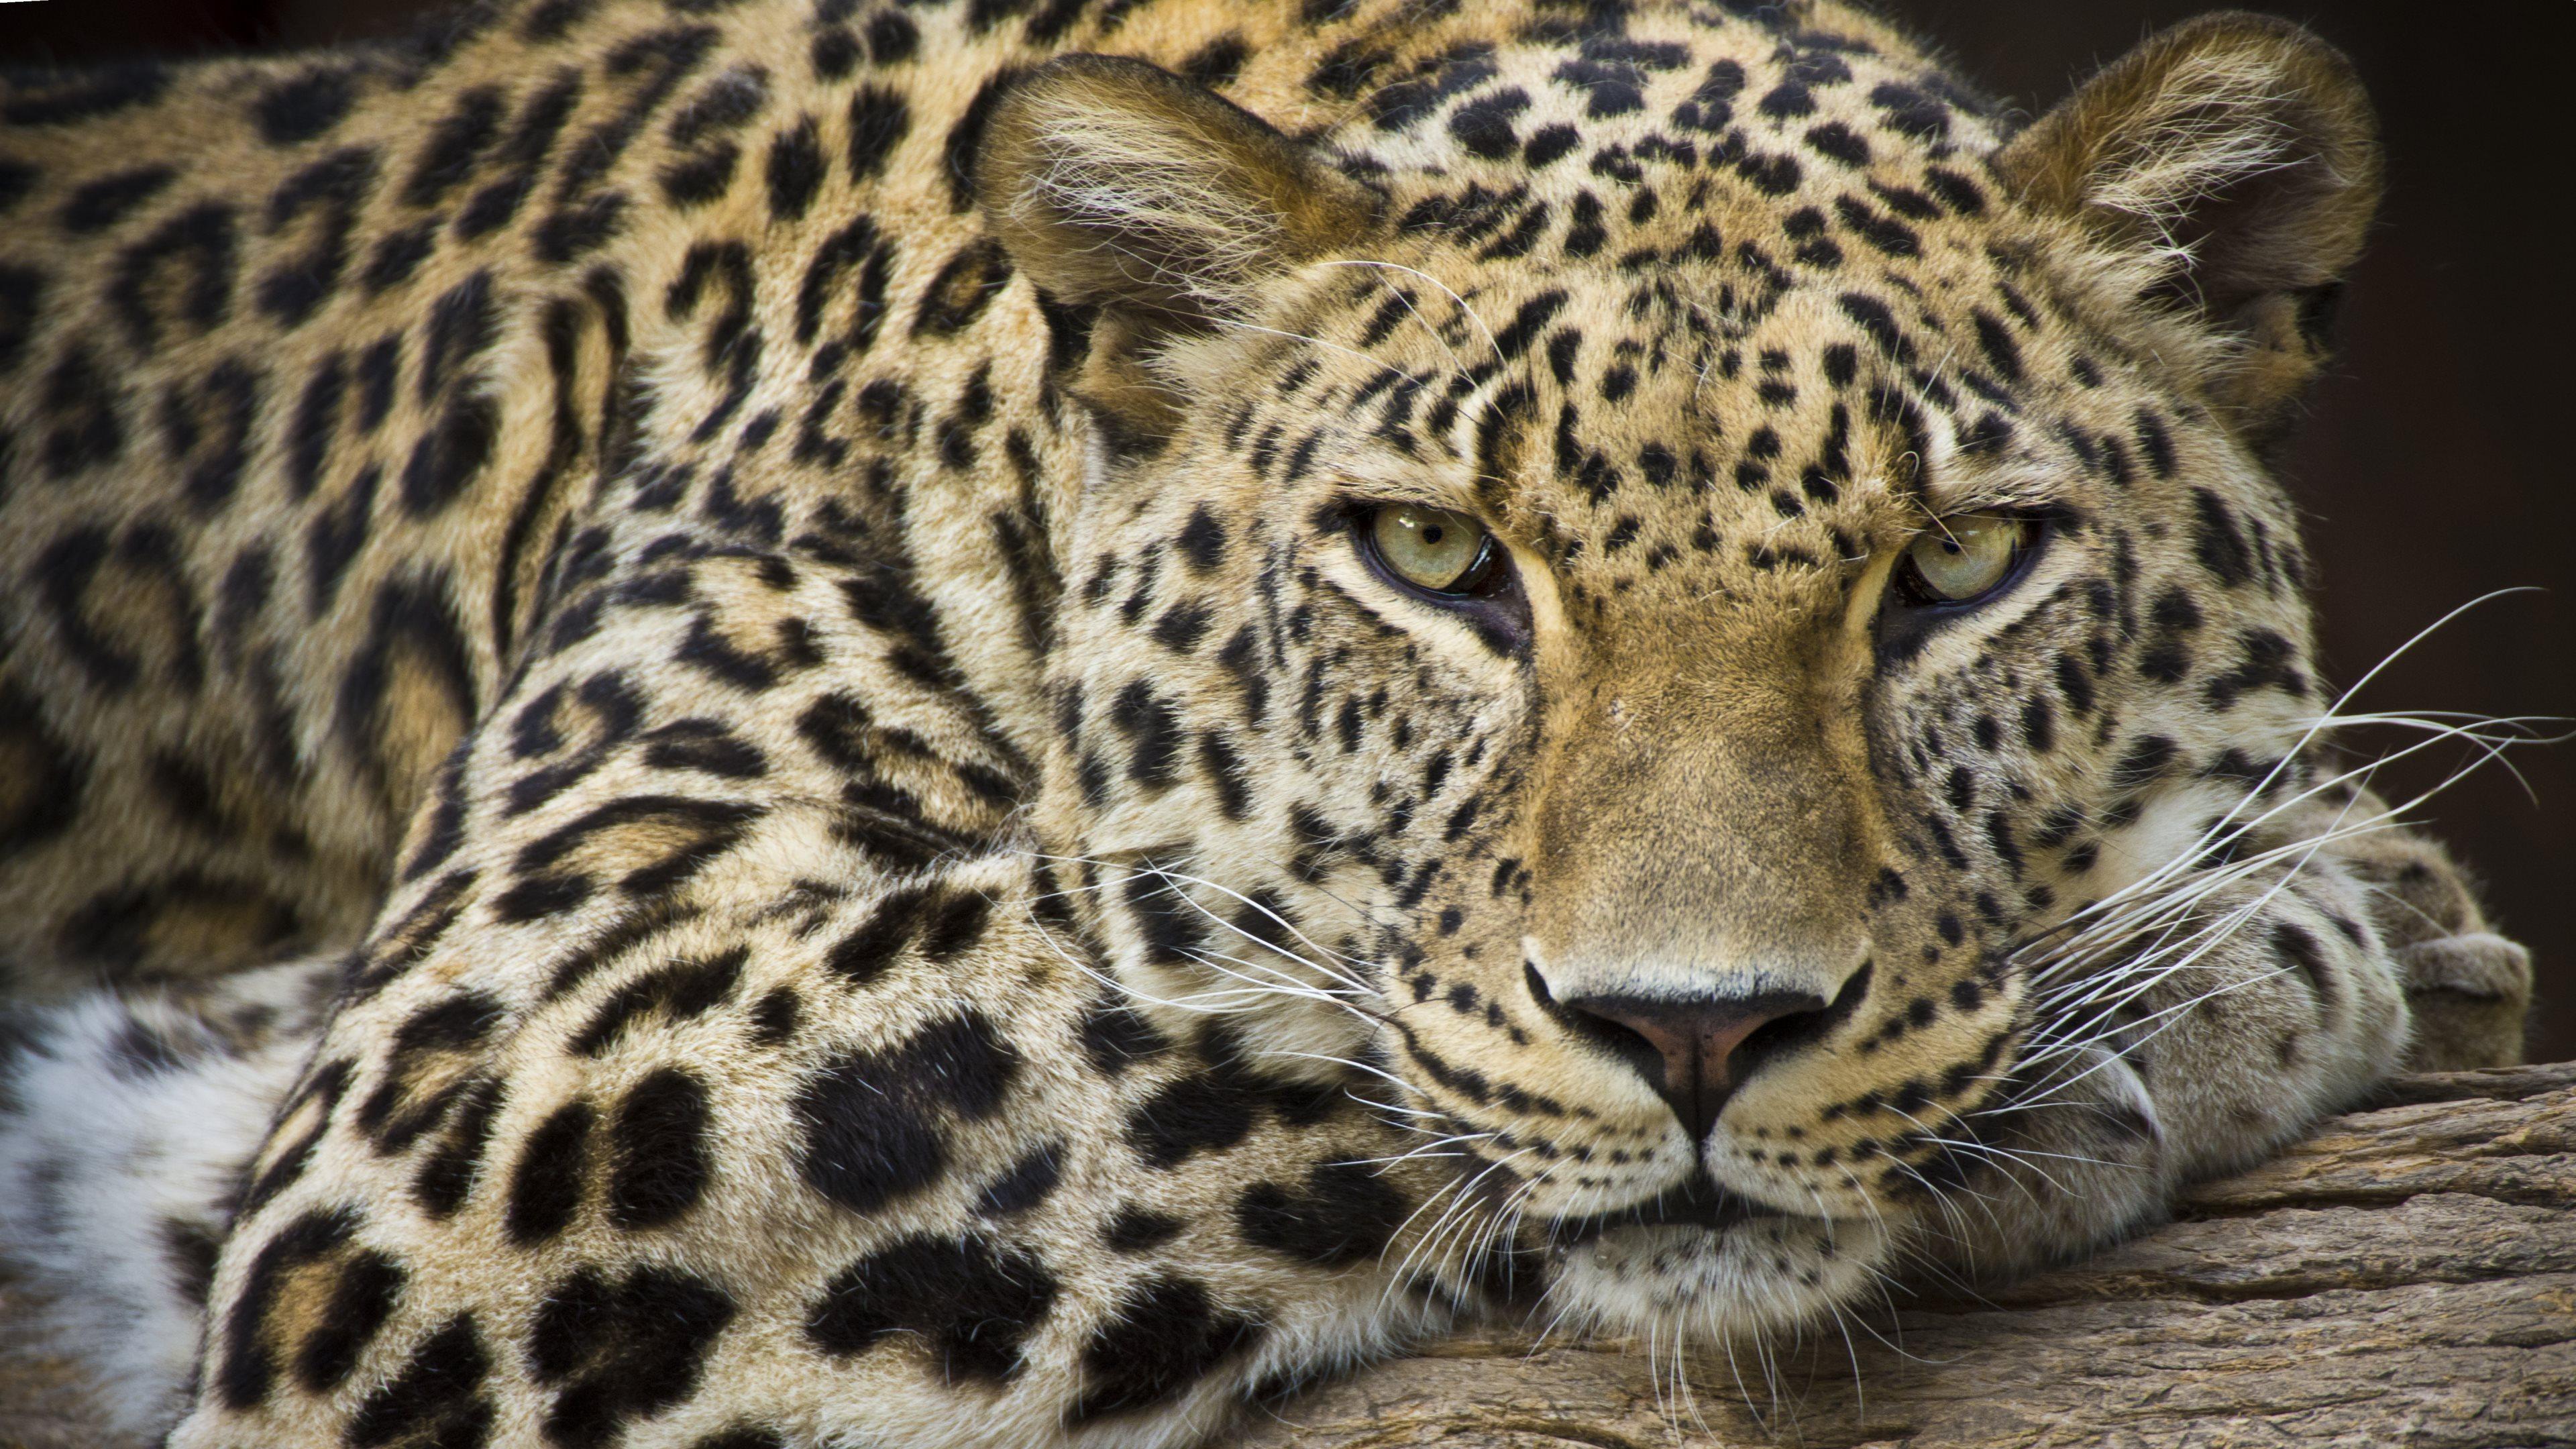 Big Cat With Spots